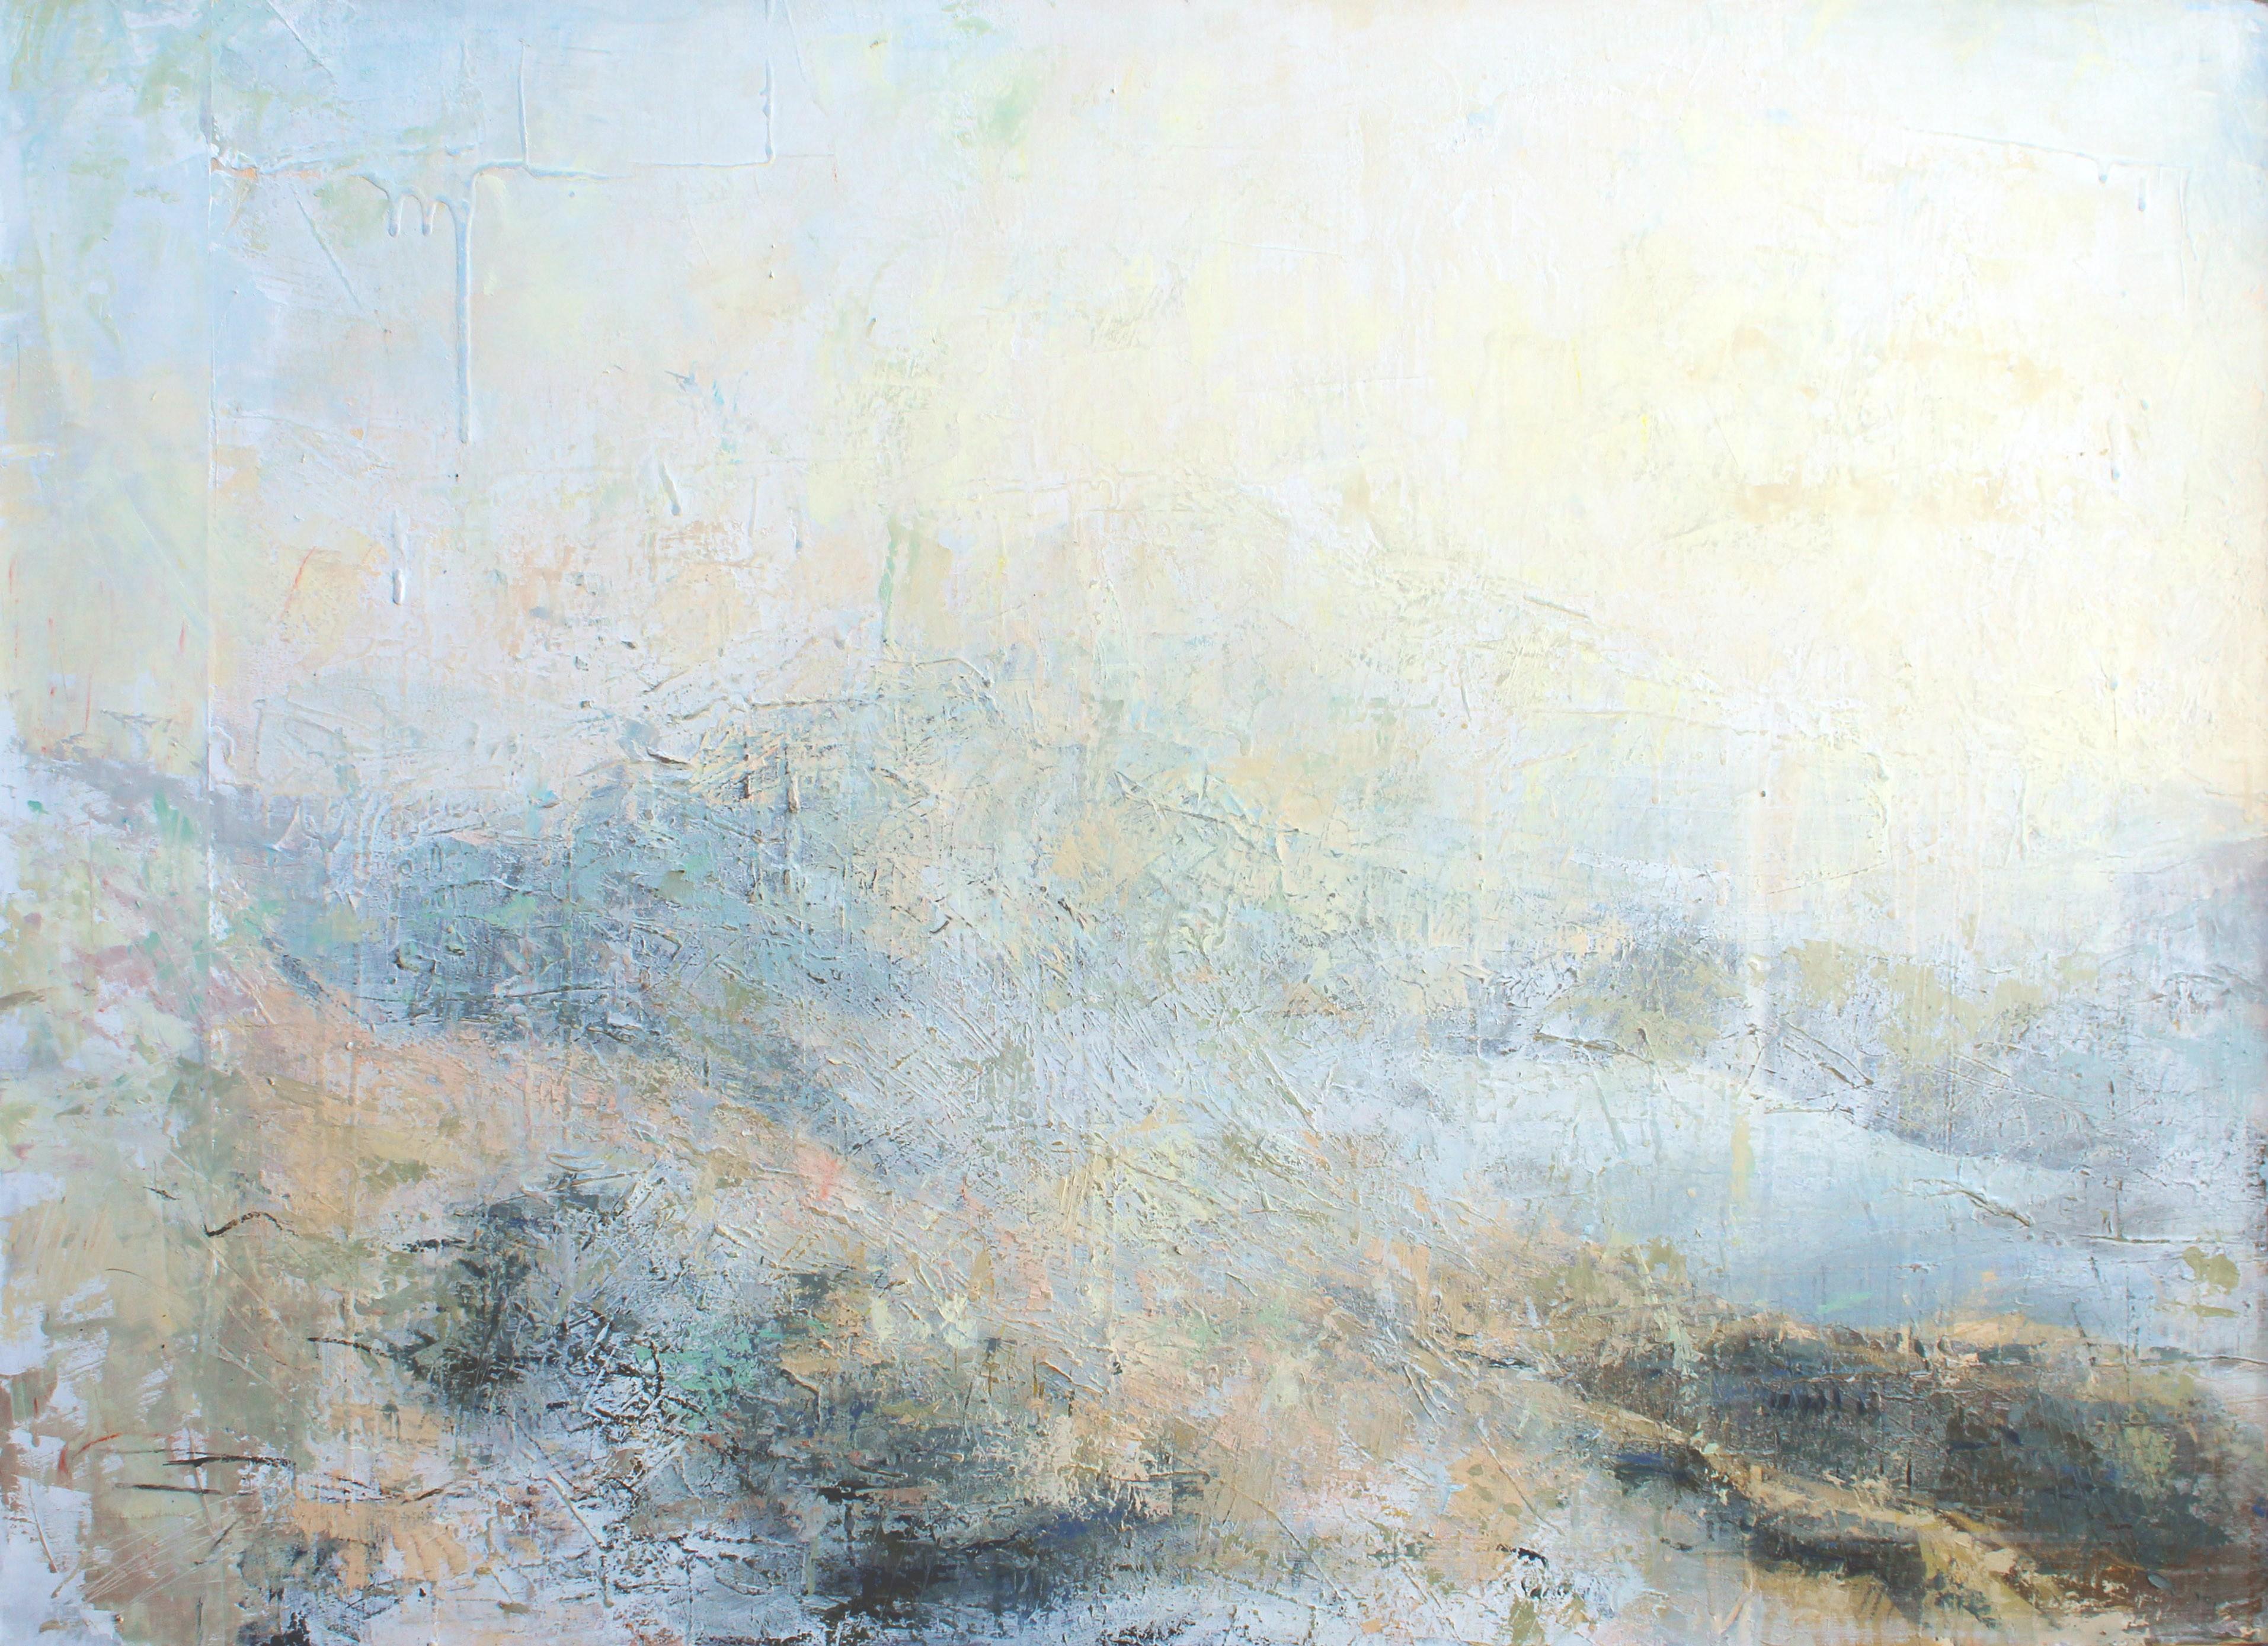 Lumiere - Snowdon    80 x 110 cm    Mixed Media